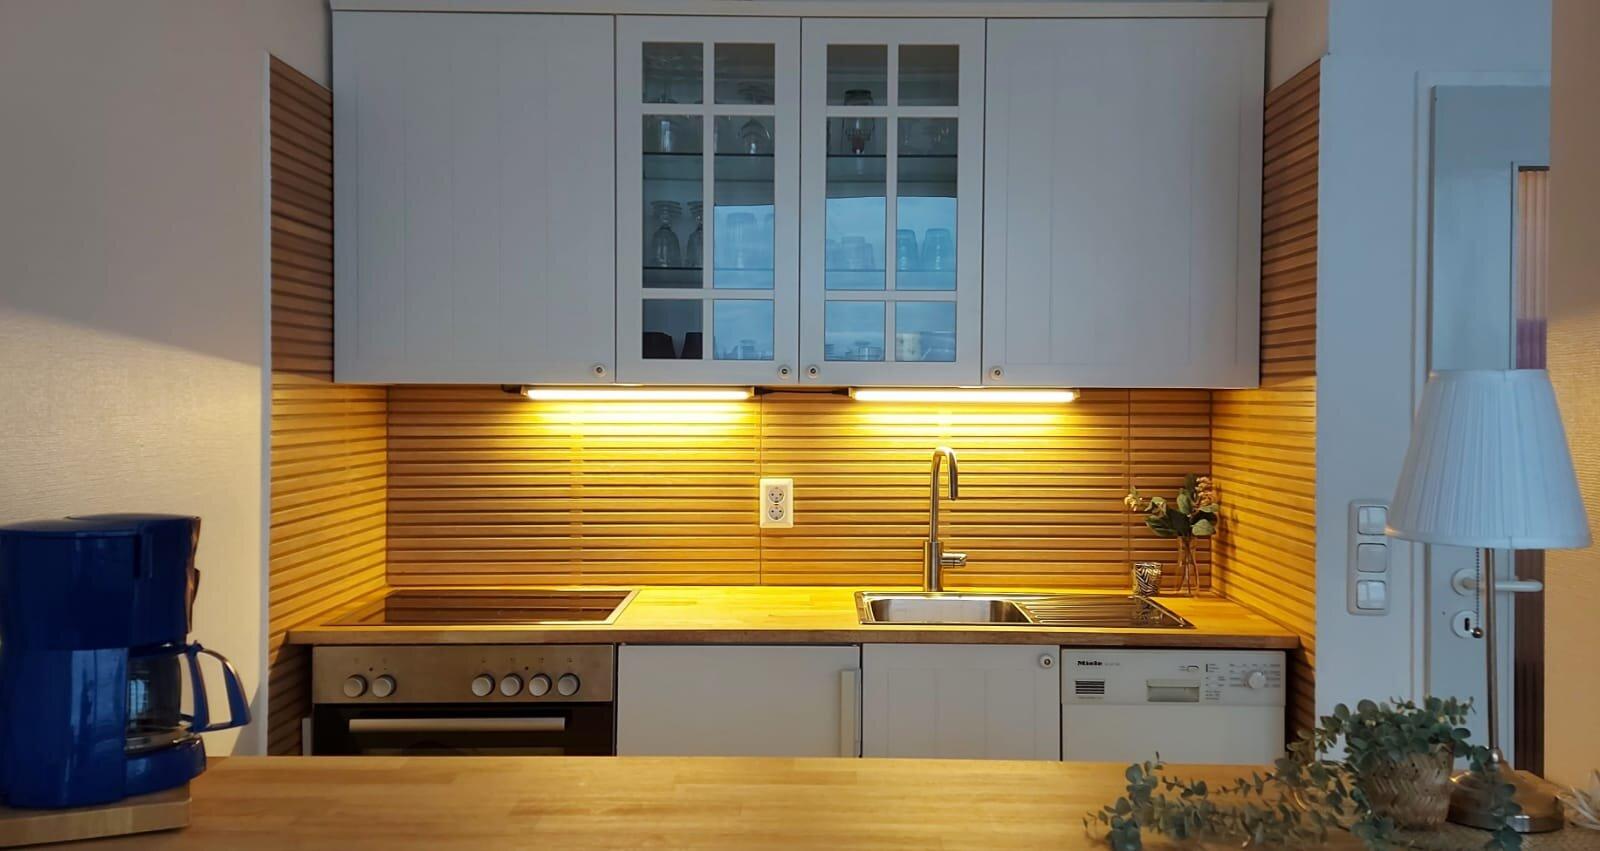 Alkoven Bett Nr. 2 - 1,35cm breit